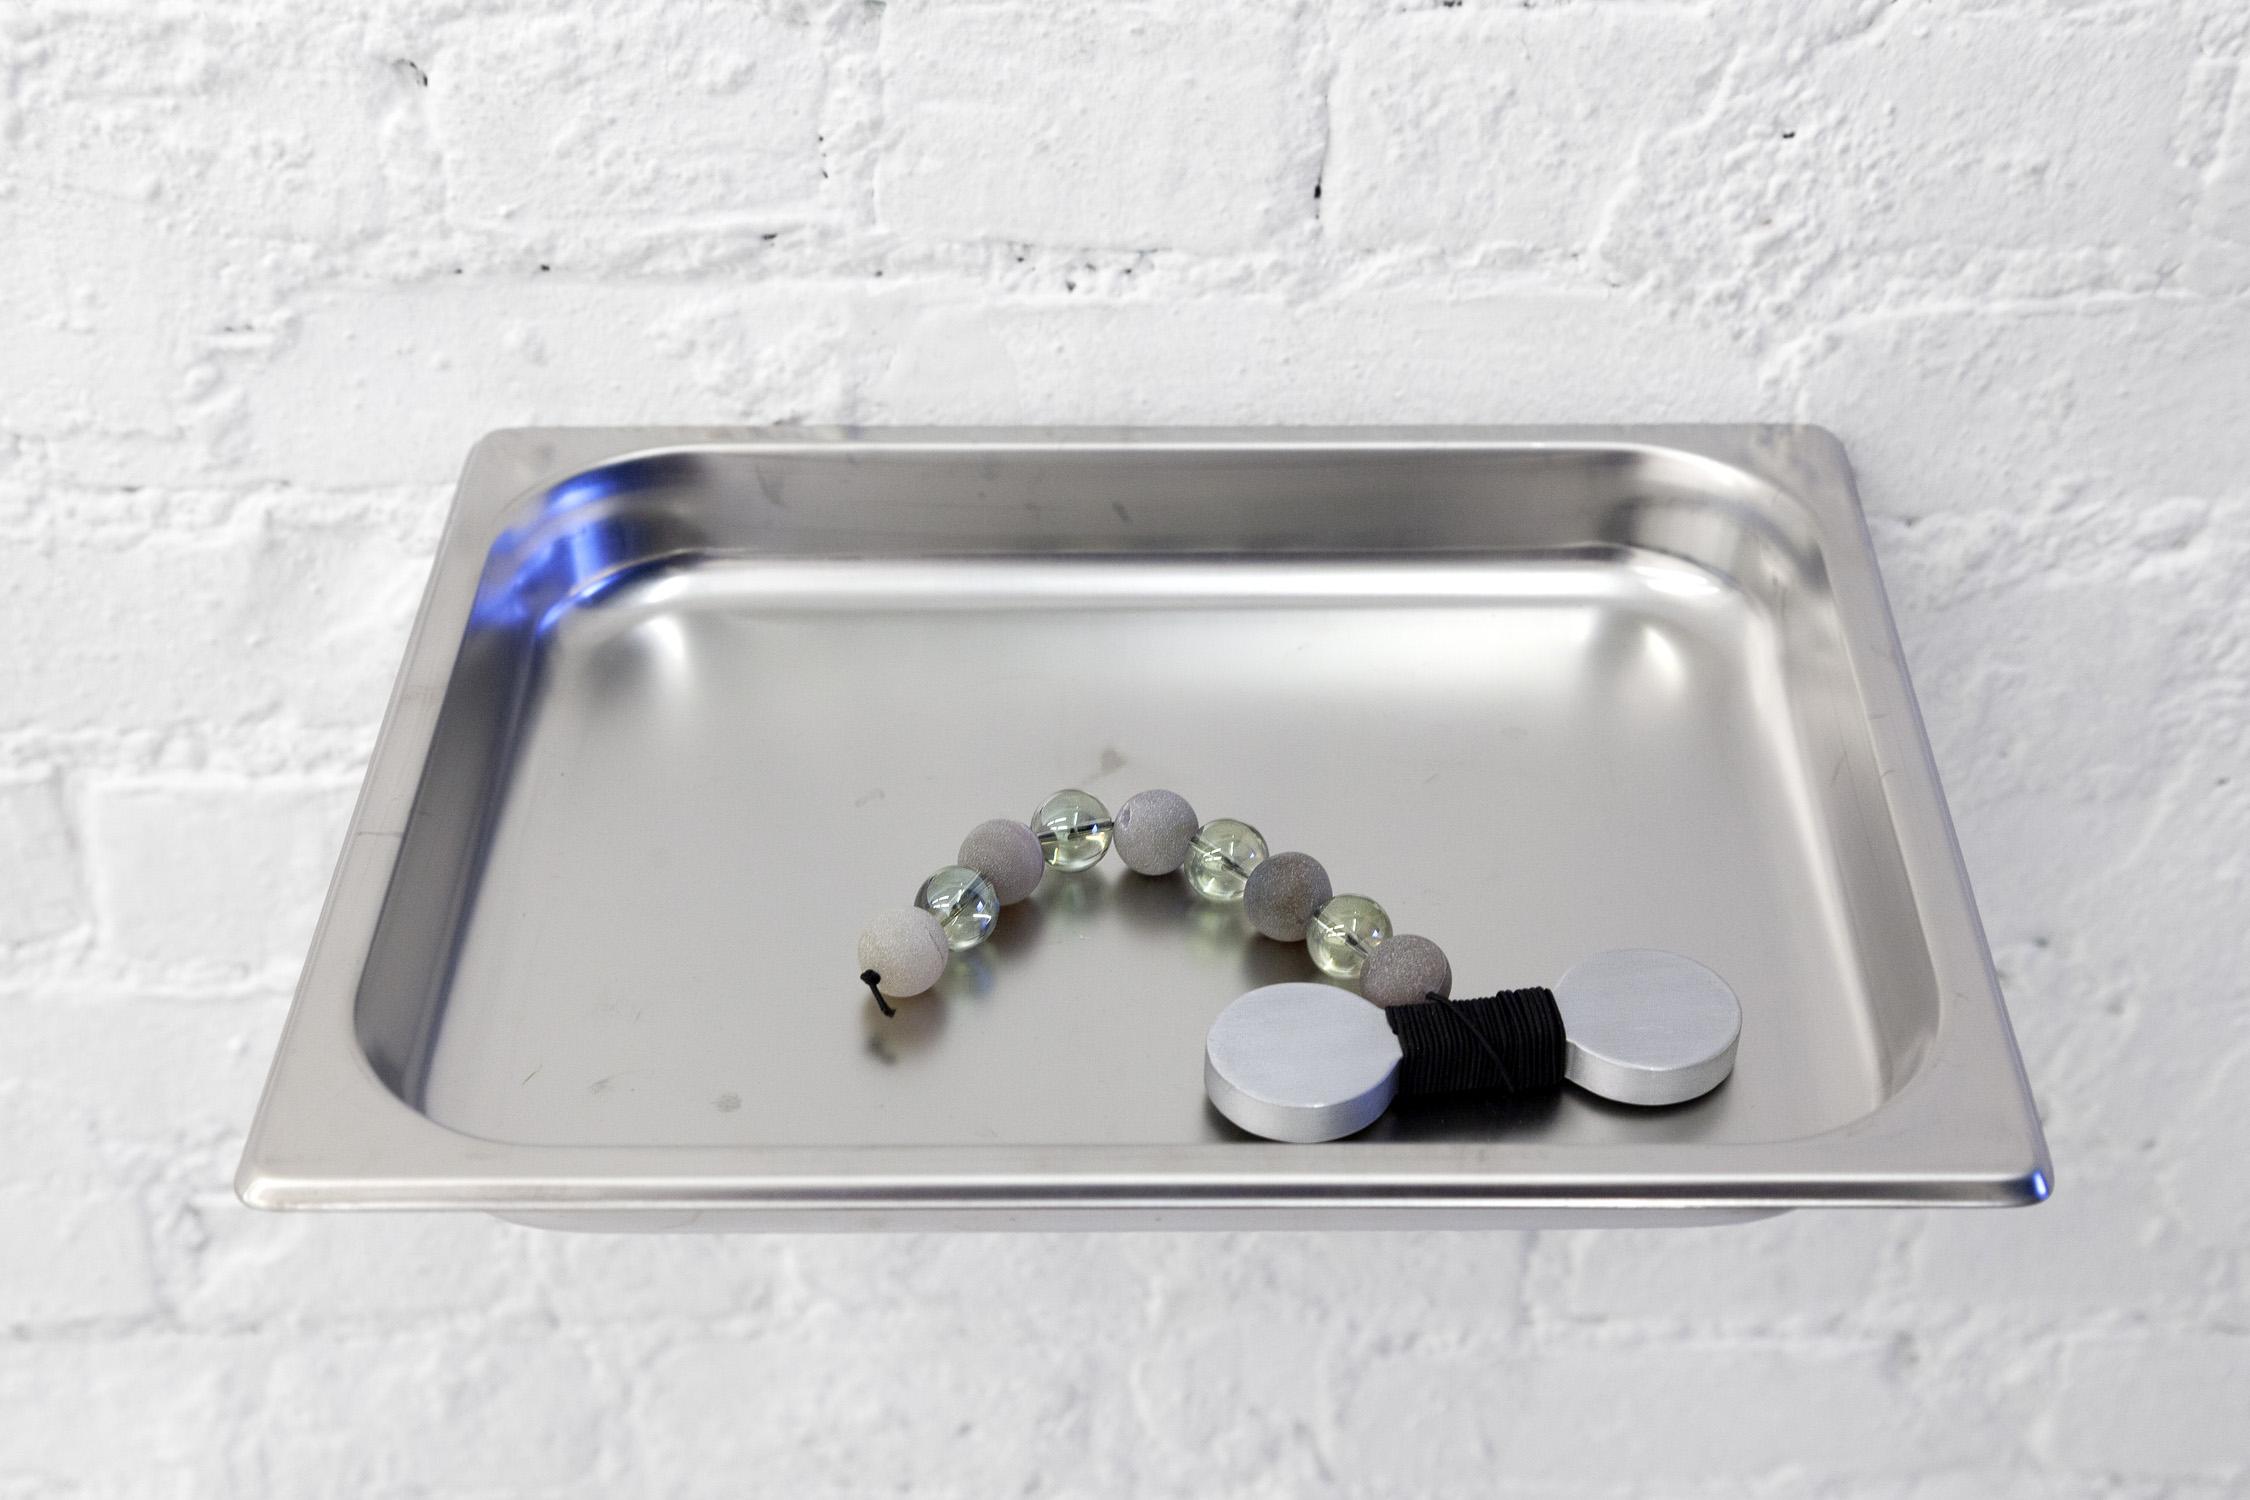 """Game Tray""  24"" x 60"" x 32"" Aluminum tray, aluminum table, marble slabs, glass marbles, aluminum 2019"